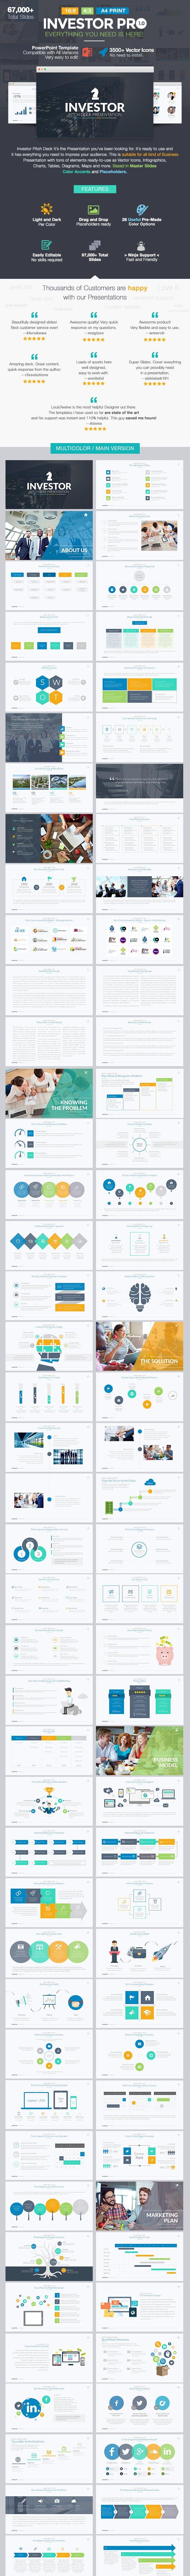 investor pitch deck powerpoint template by louistwelve design